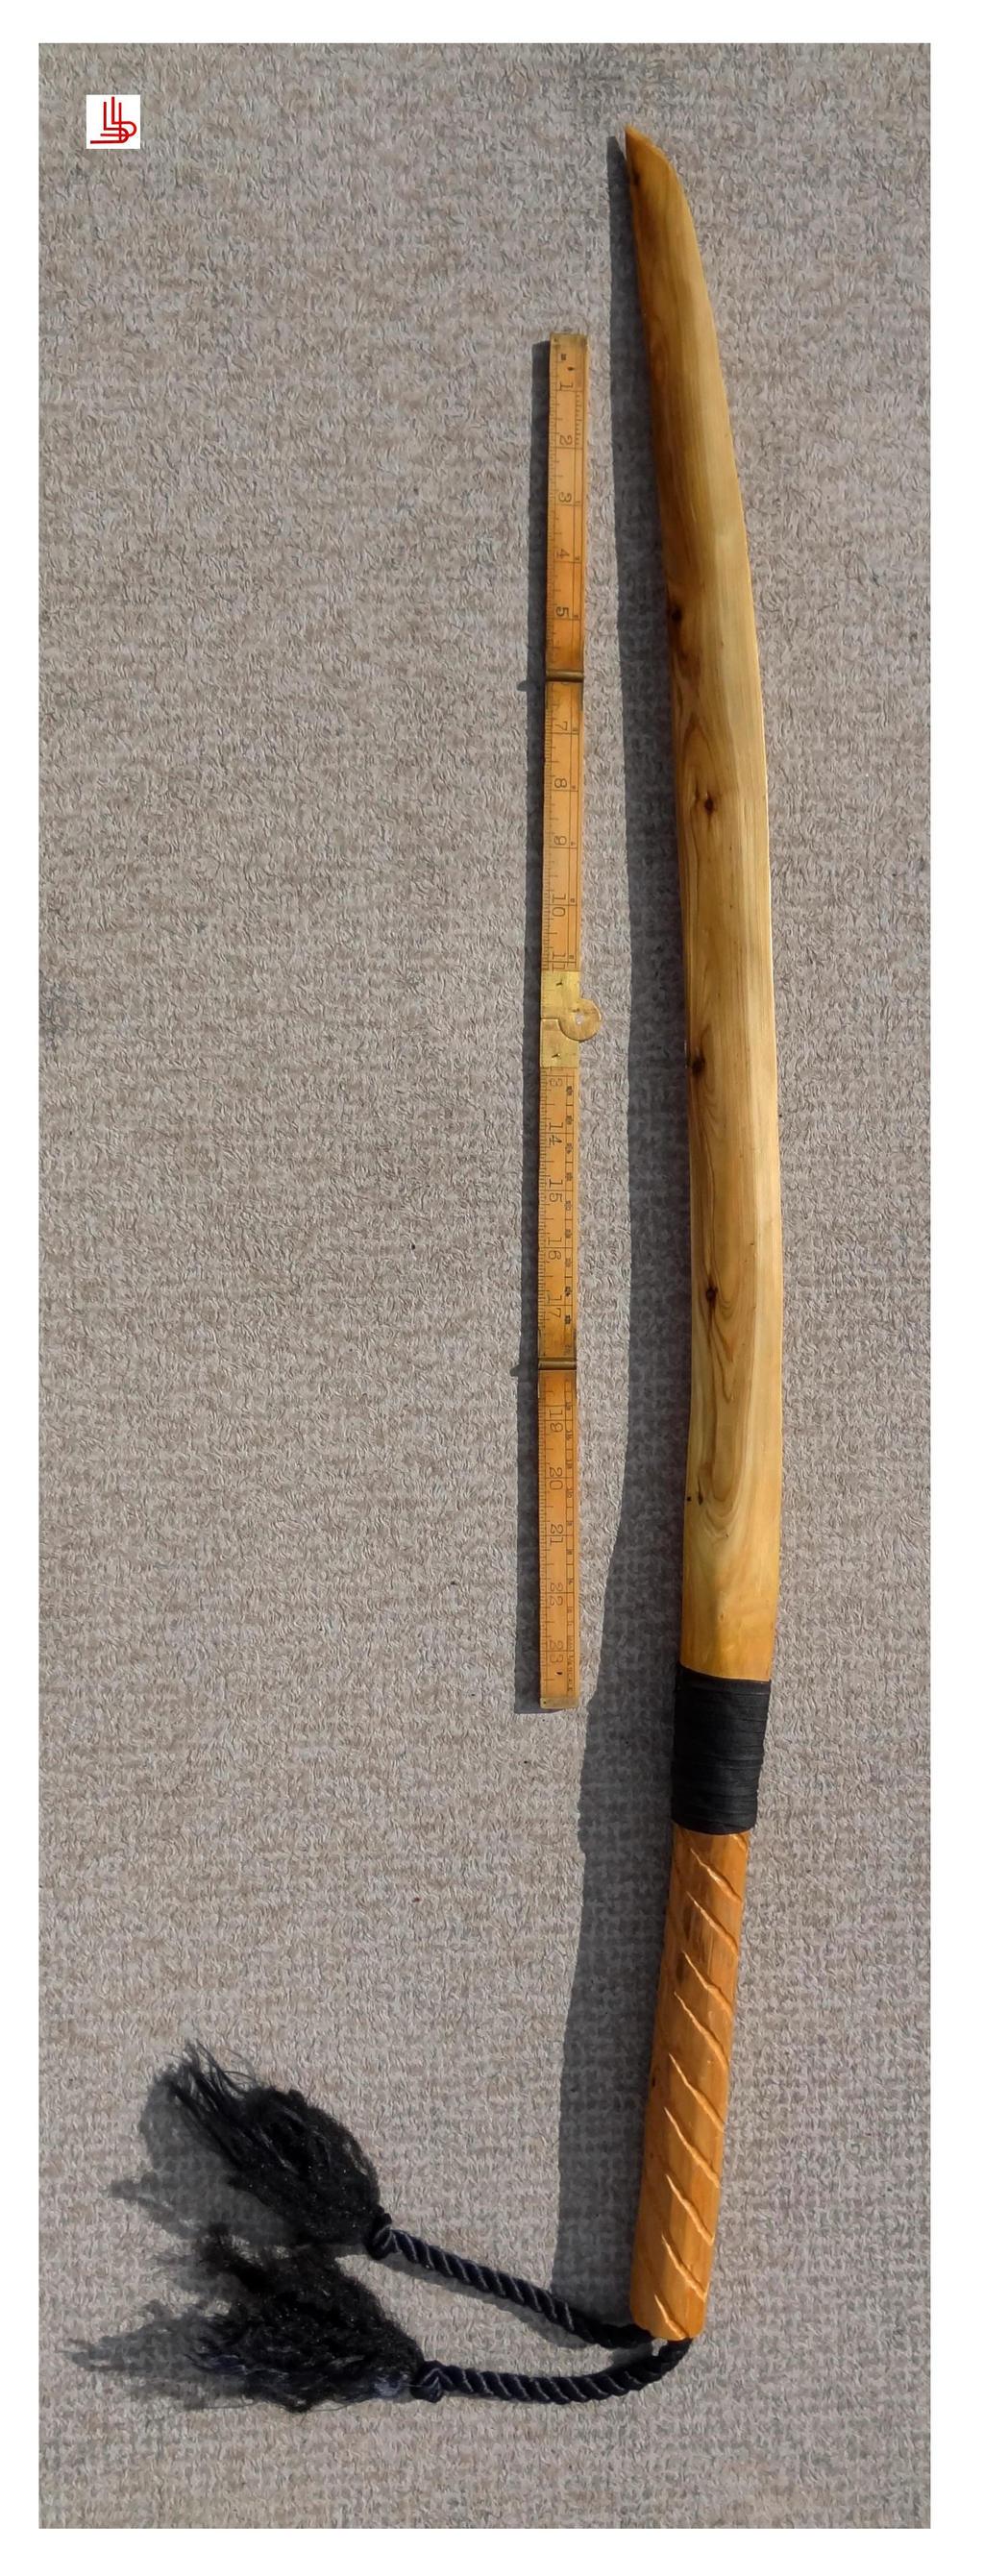 Cedar samurai by Obsidian-Asphodel